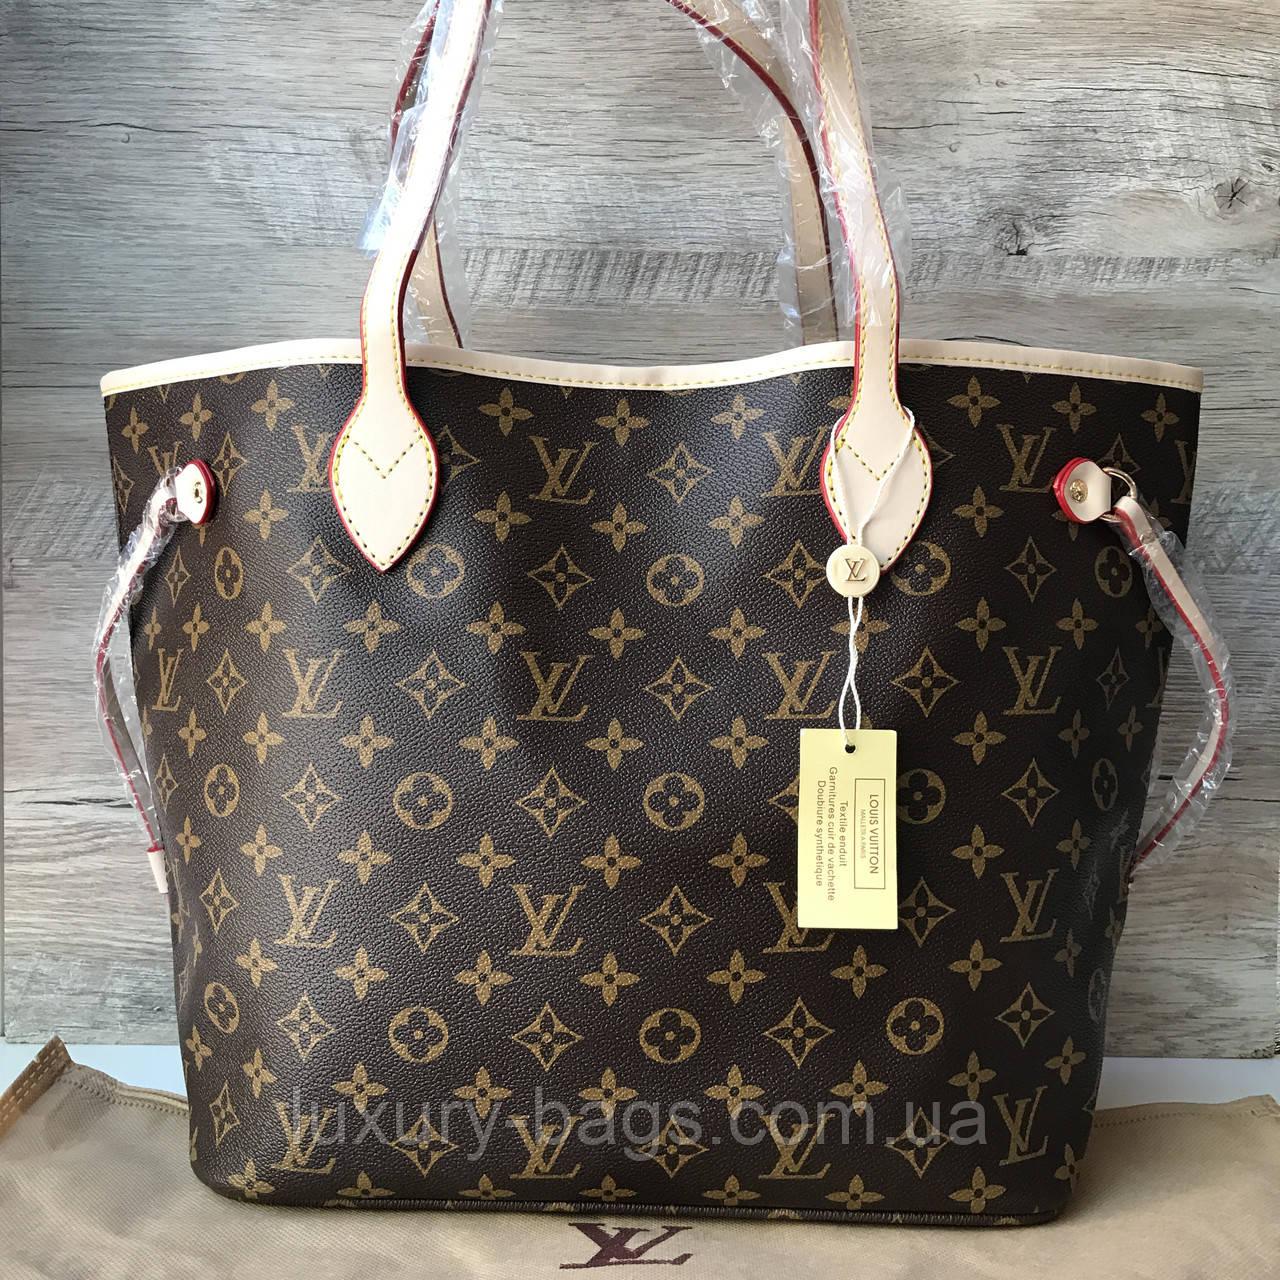 c6a4571576c4 Женская сумка Louis Vuitton neverfull Луи Виттон неверфул - BaGsInTrend в  Одессе